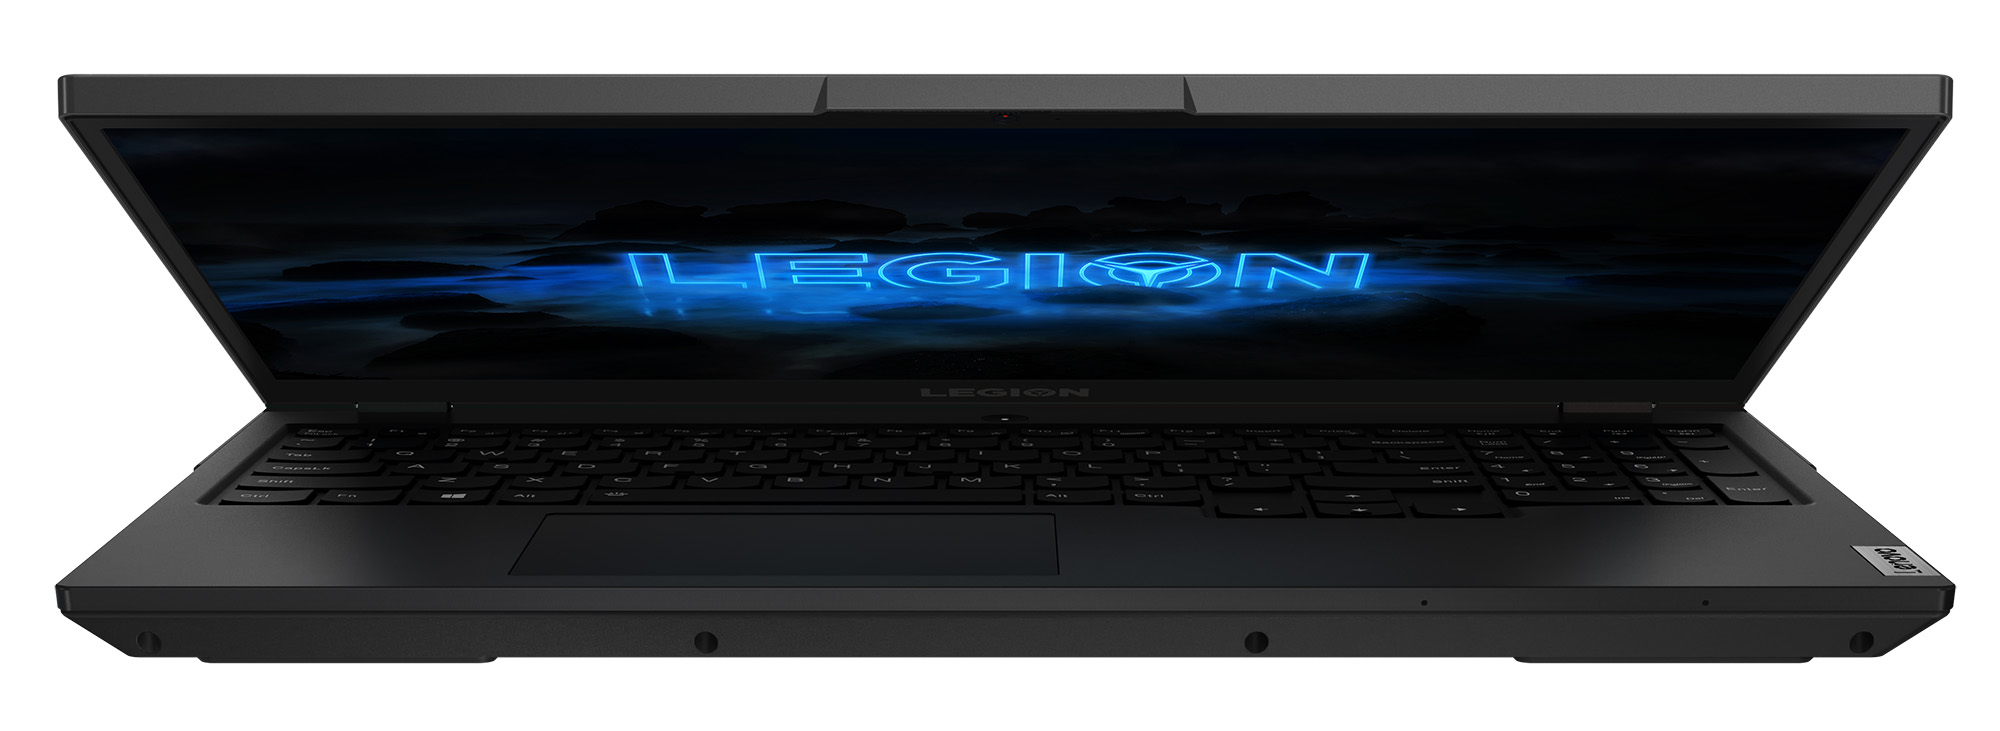 Фото  Ноутбук Lenovo Legion 5i 17IMH05H Phantom Black (82B3004XRE)